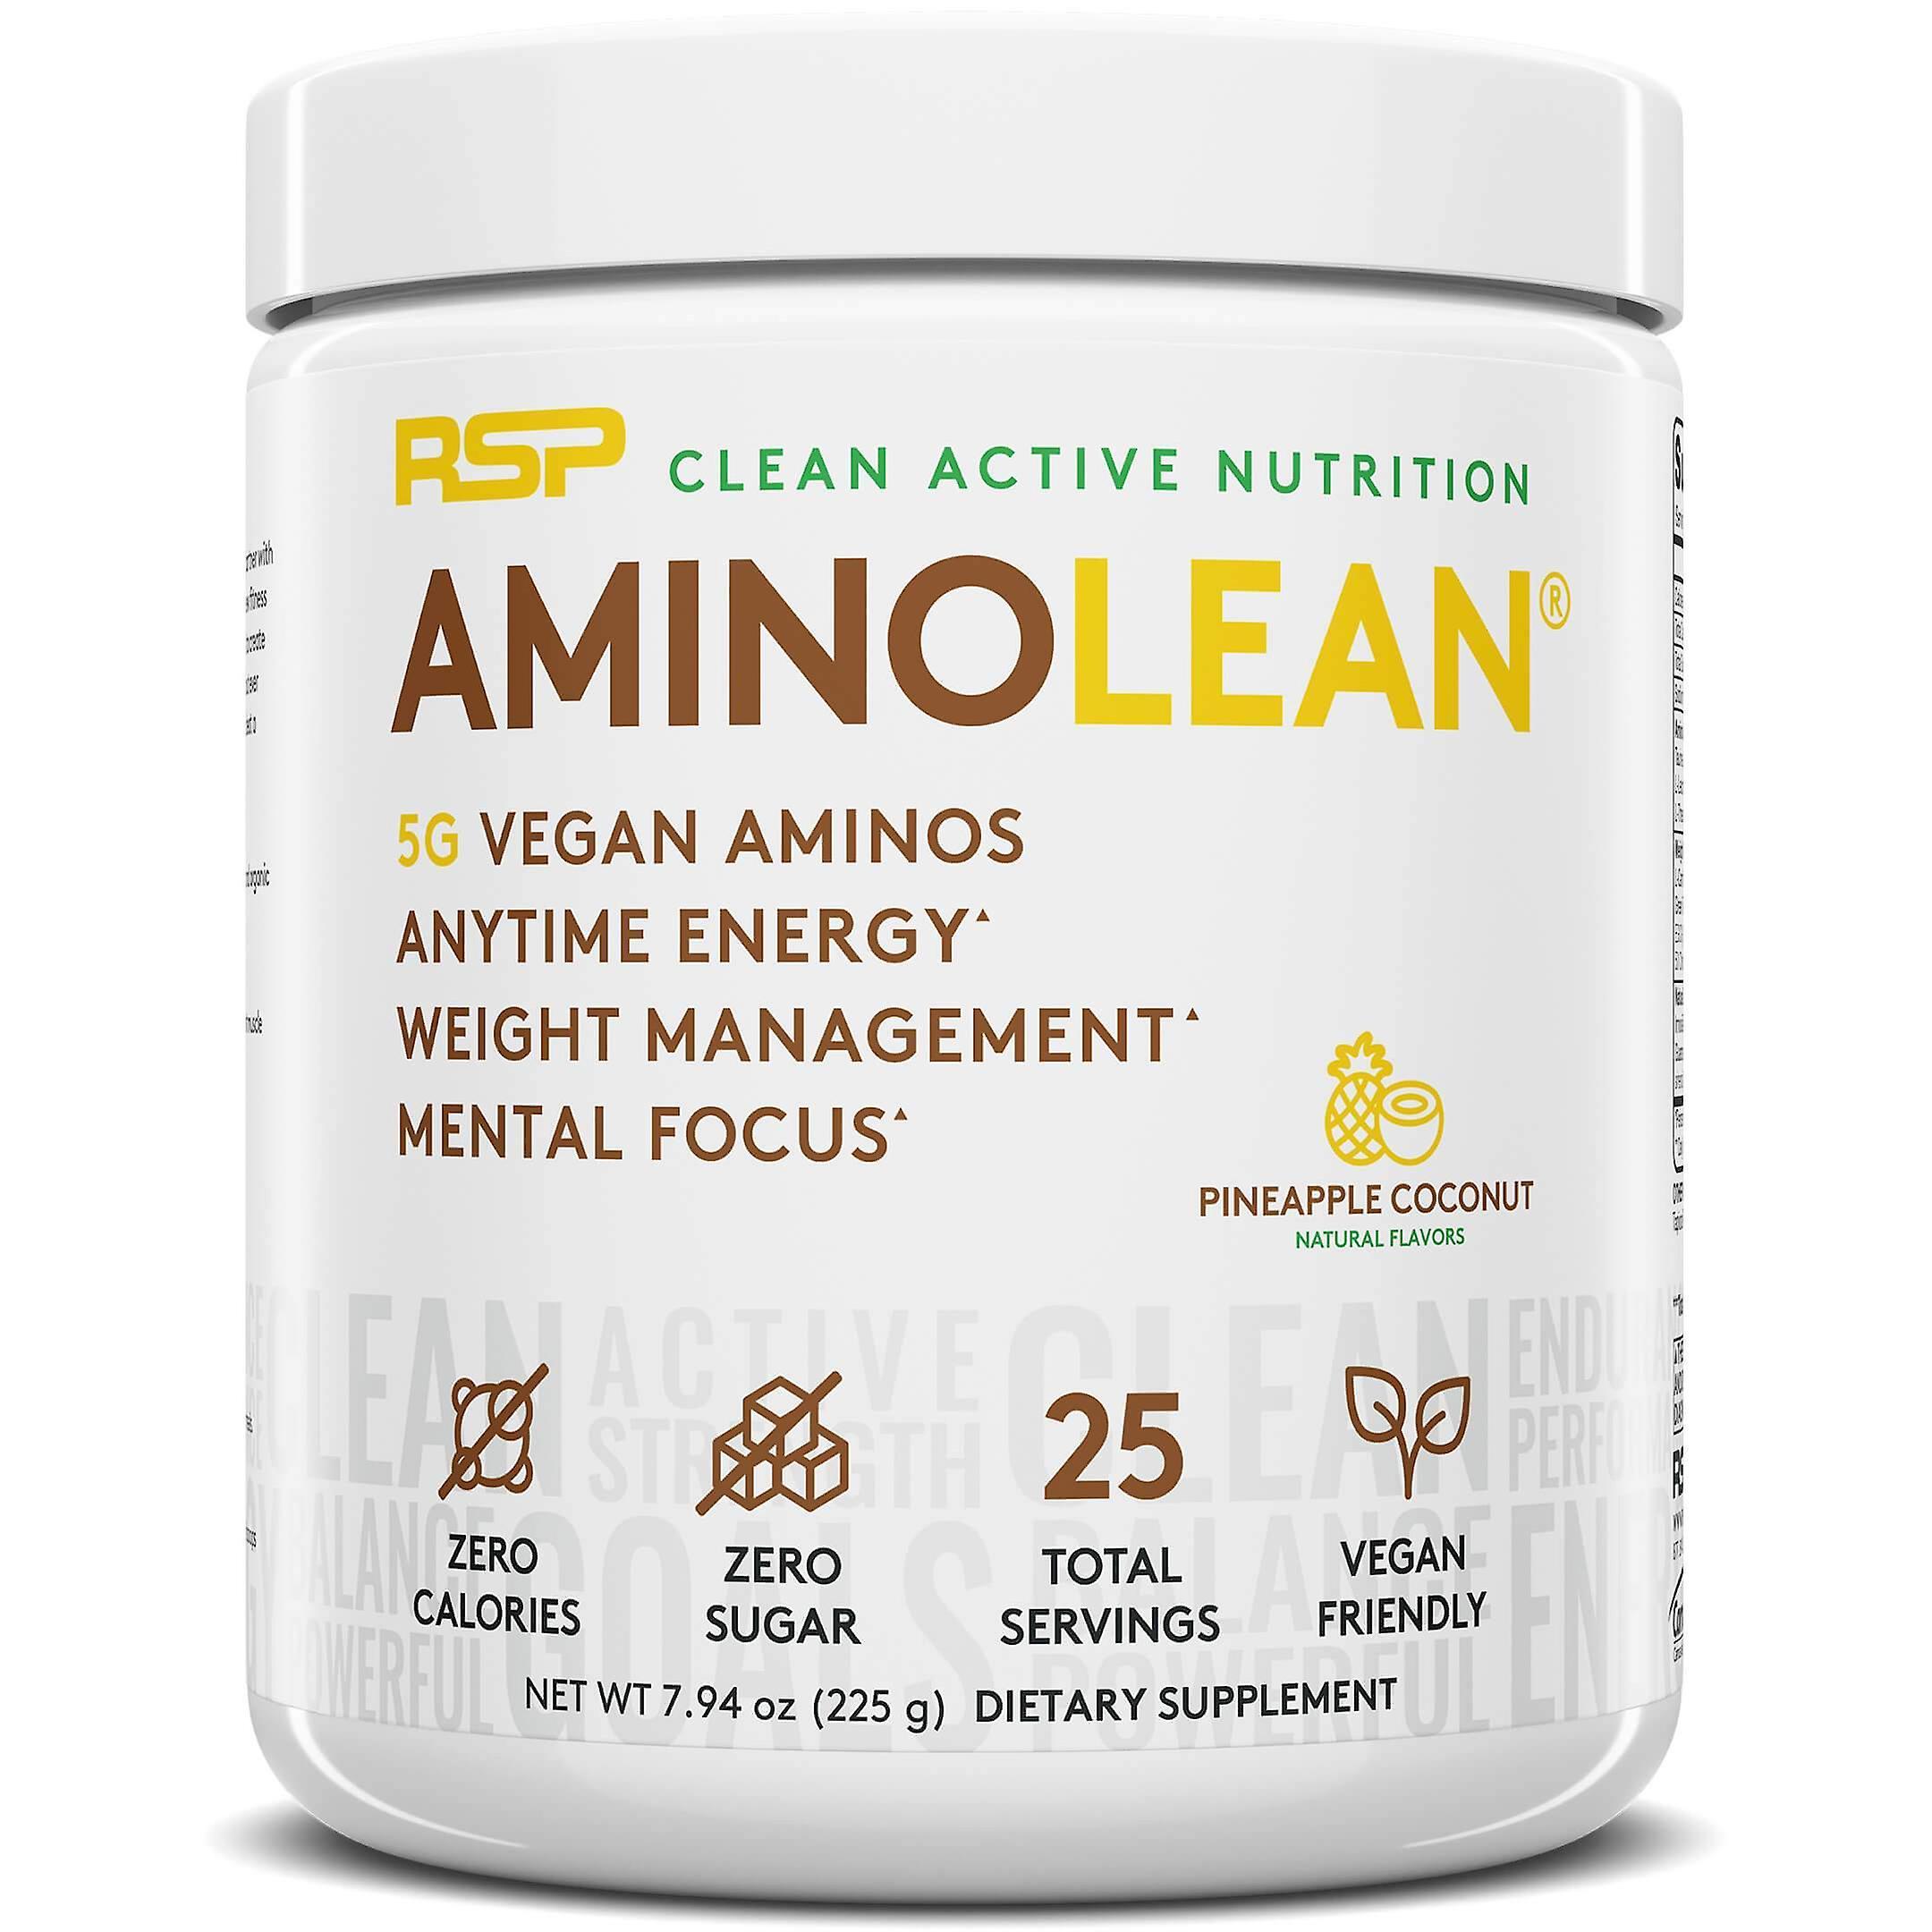 Rsp vegan aminolean, pre-workout, energy, fat burner, amino acid powder (pineapple coconut, 25 servings)